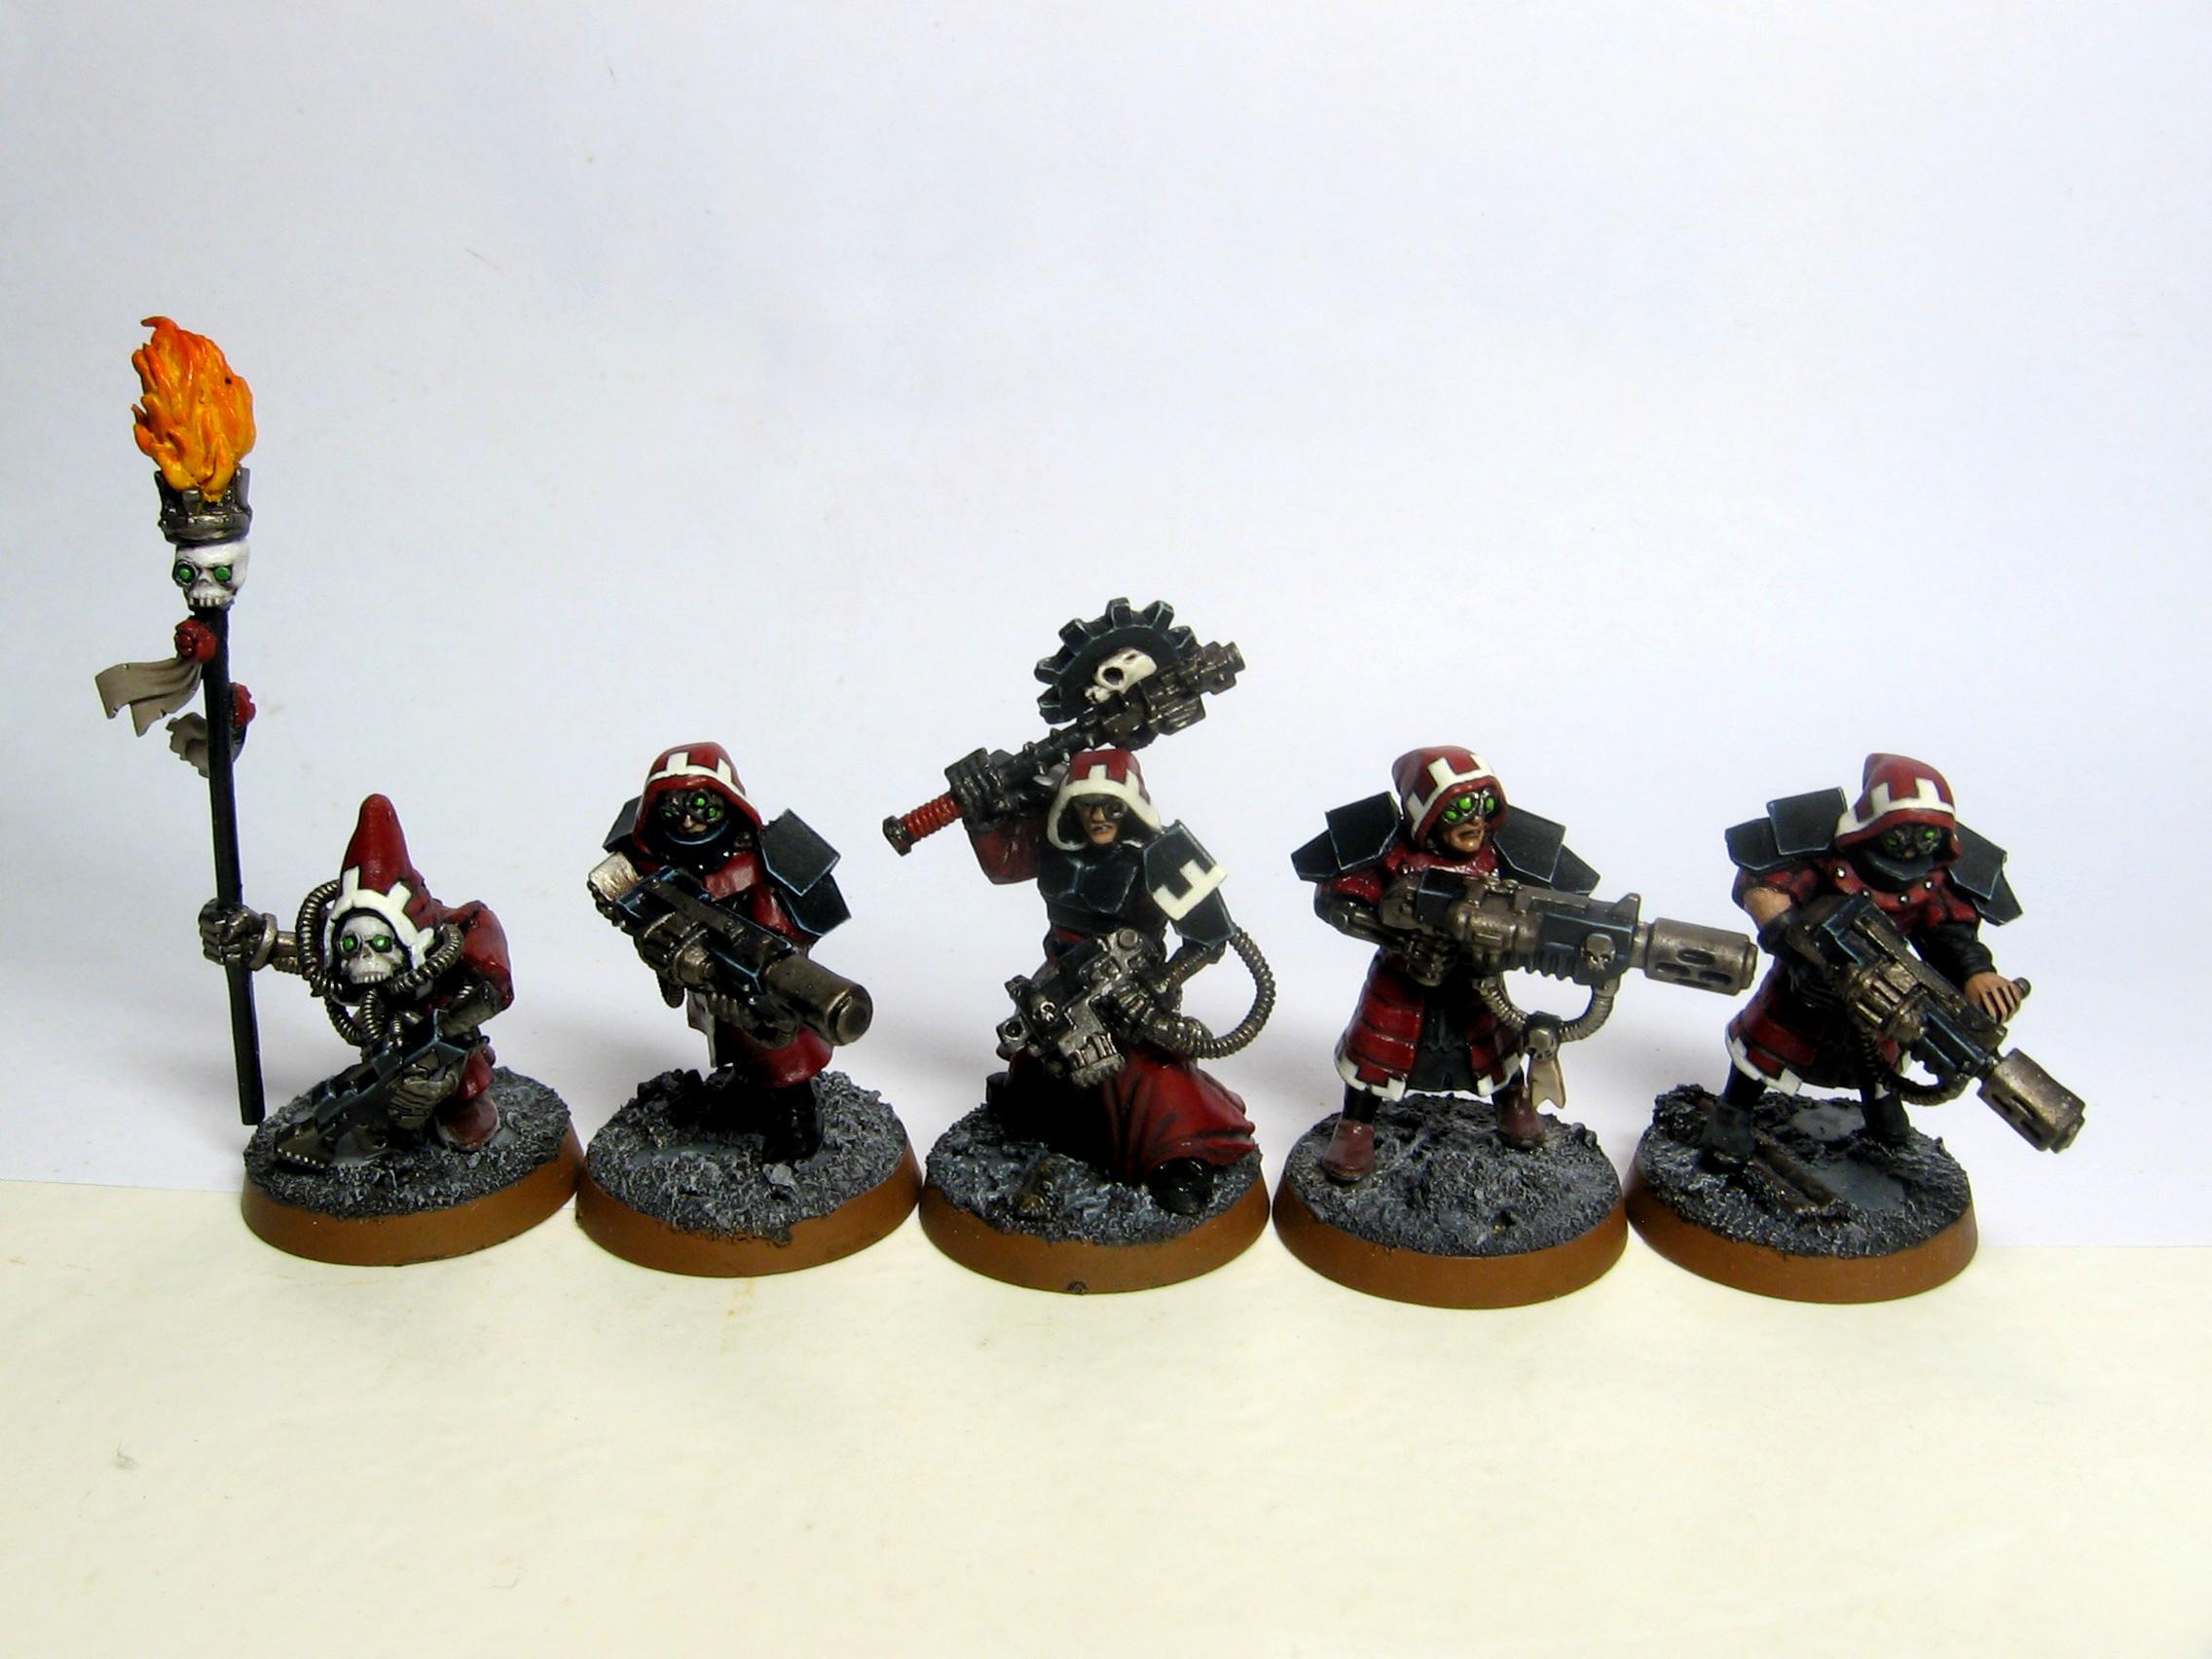 Adeptus Mechanicus, Command Squad, Conversion, Imperial Guard, Mechanicus, Veteran, Warhammer 40,000